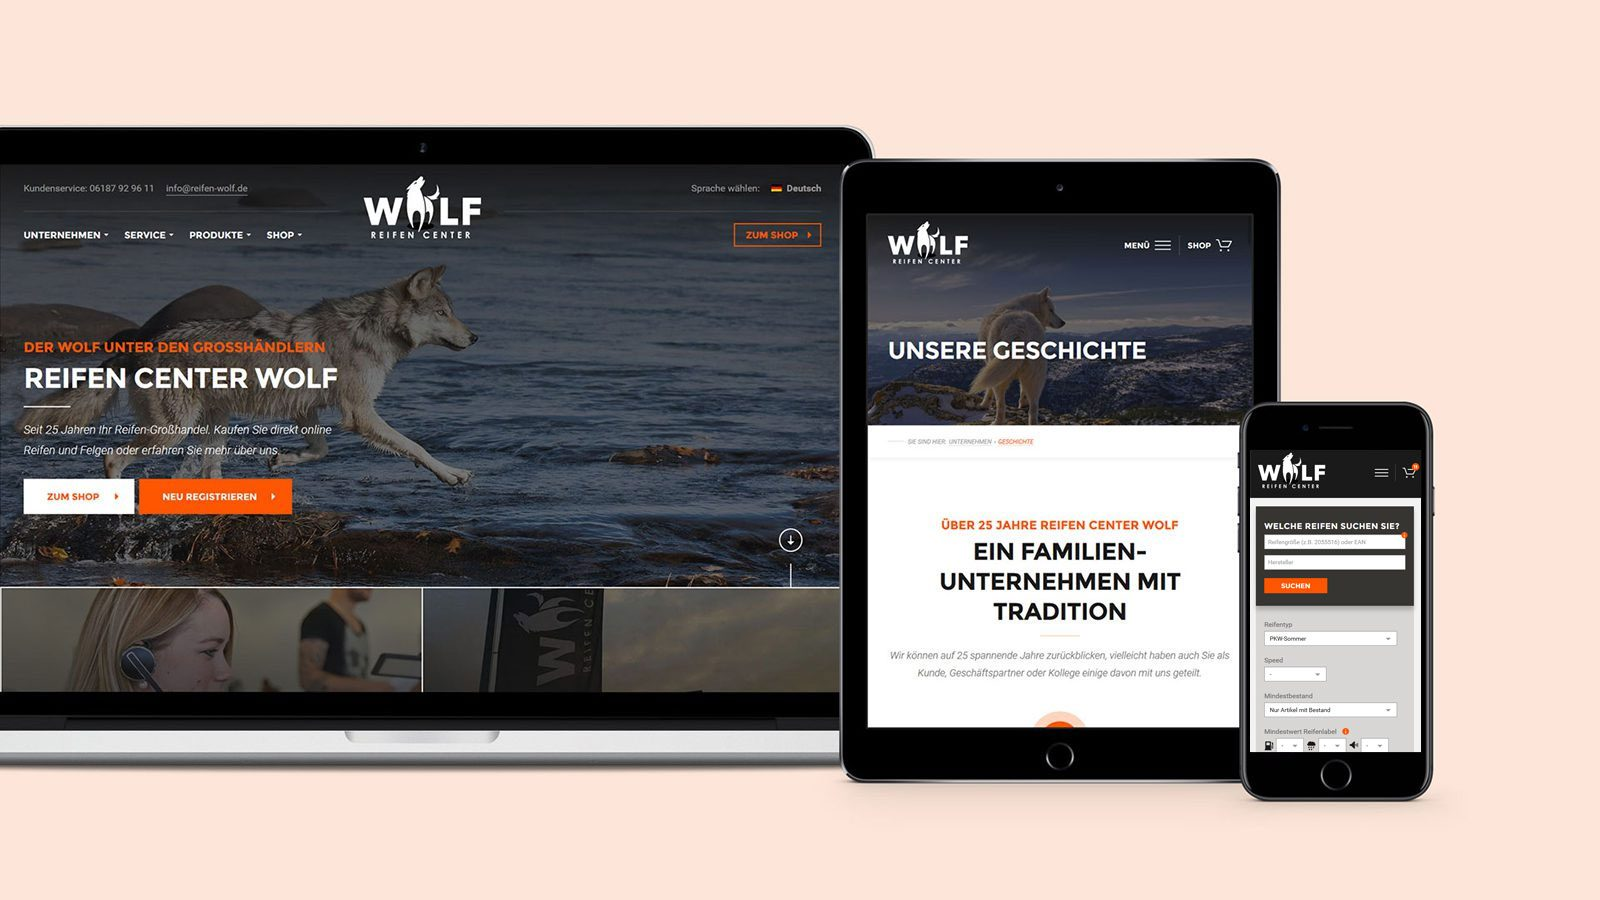 Mobile-Webshop-App-Reifen-Wolf